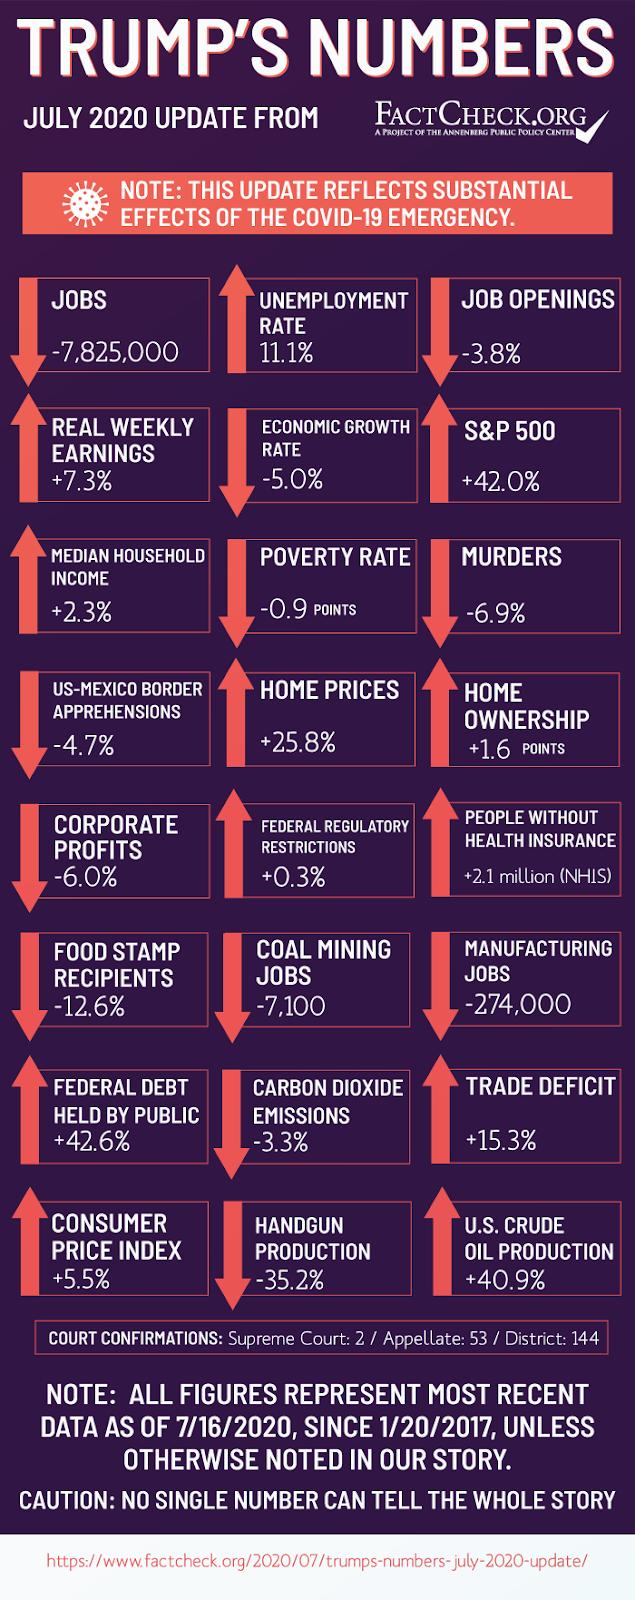 Trump's Numbers July 2020 Update